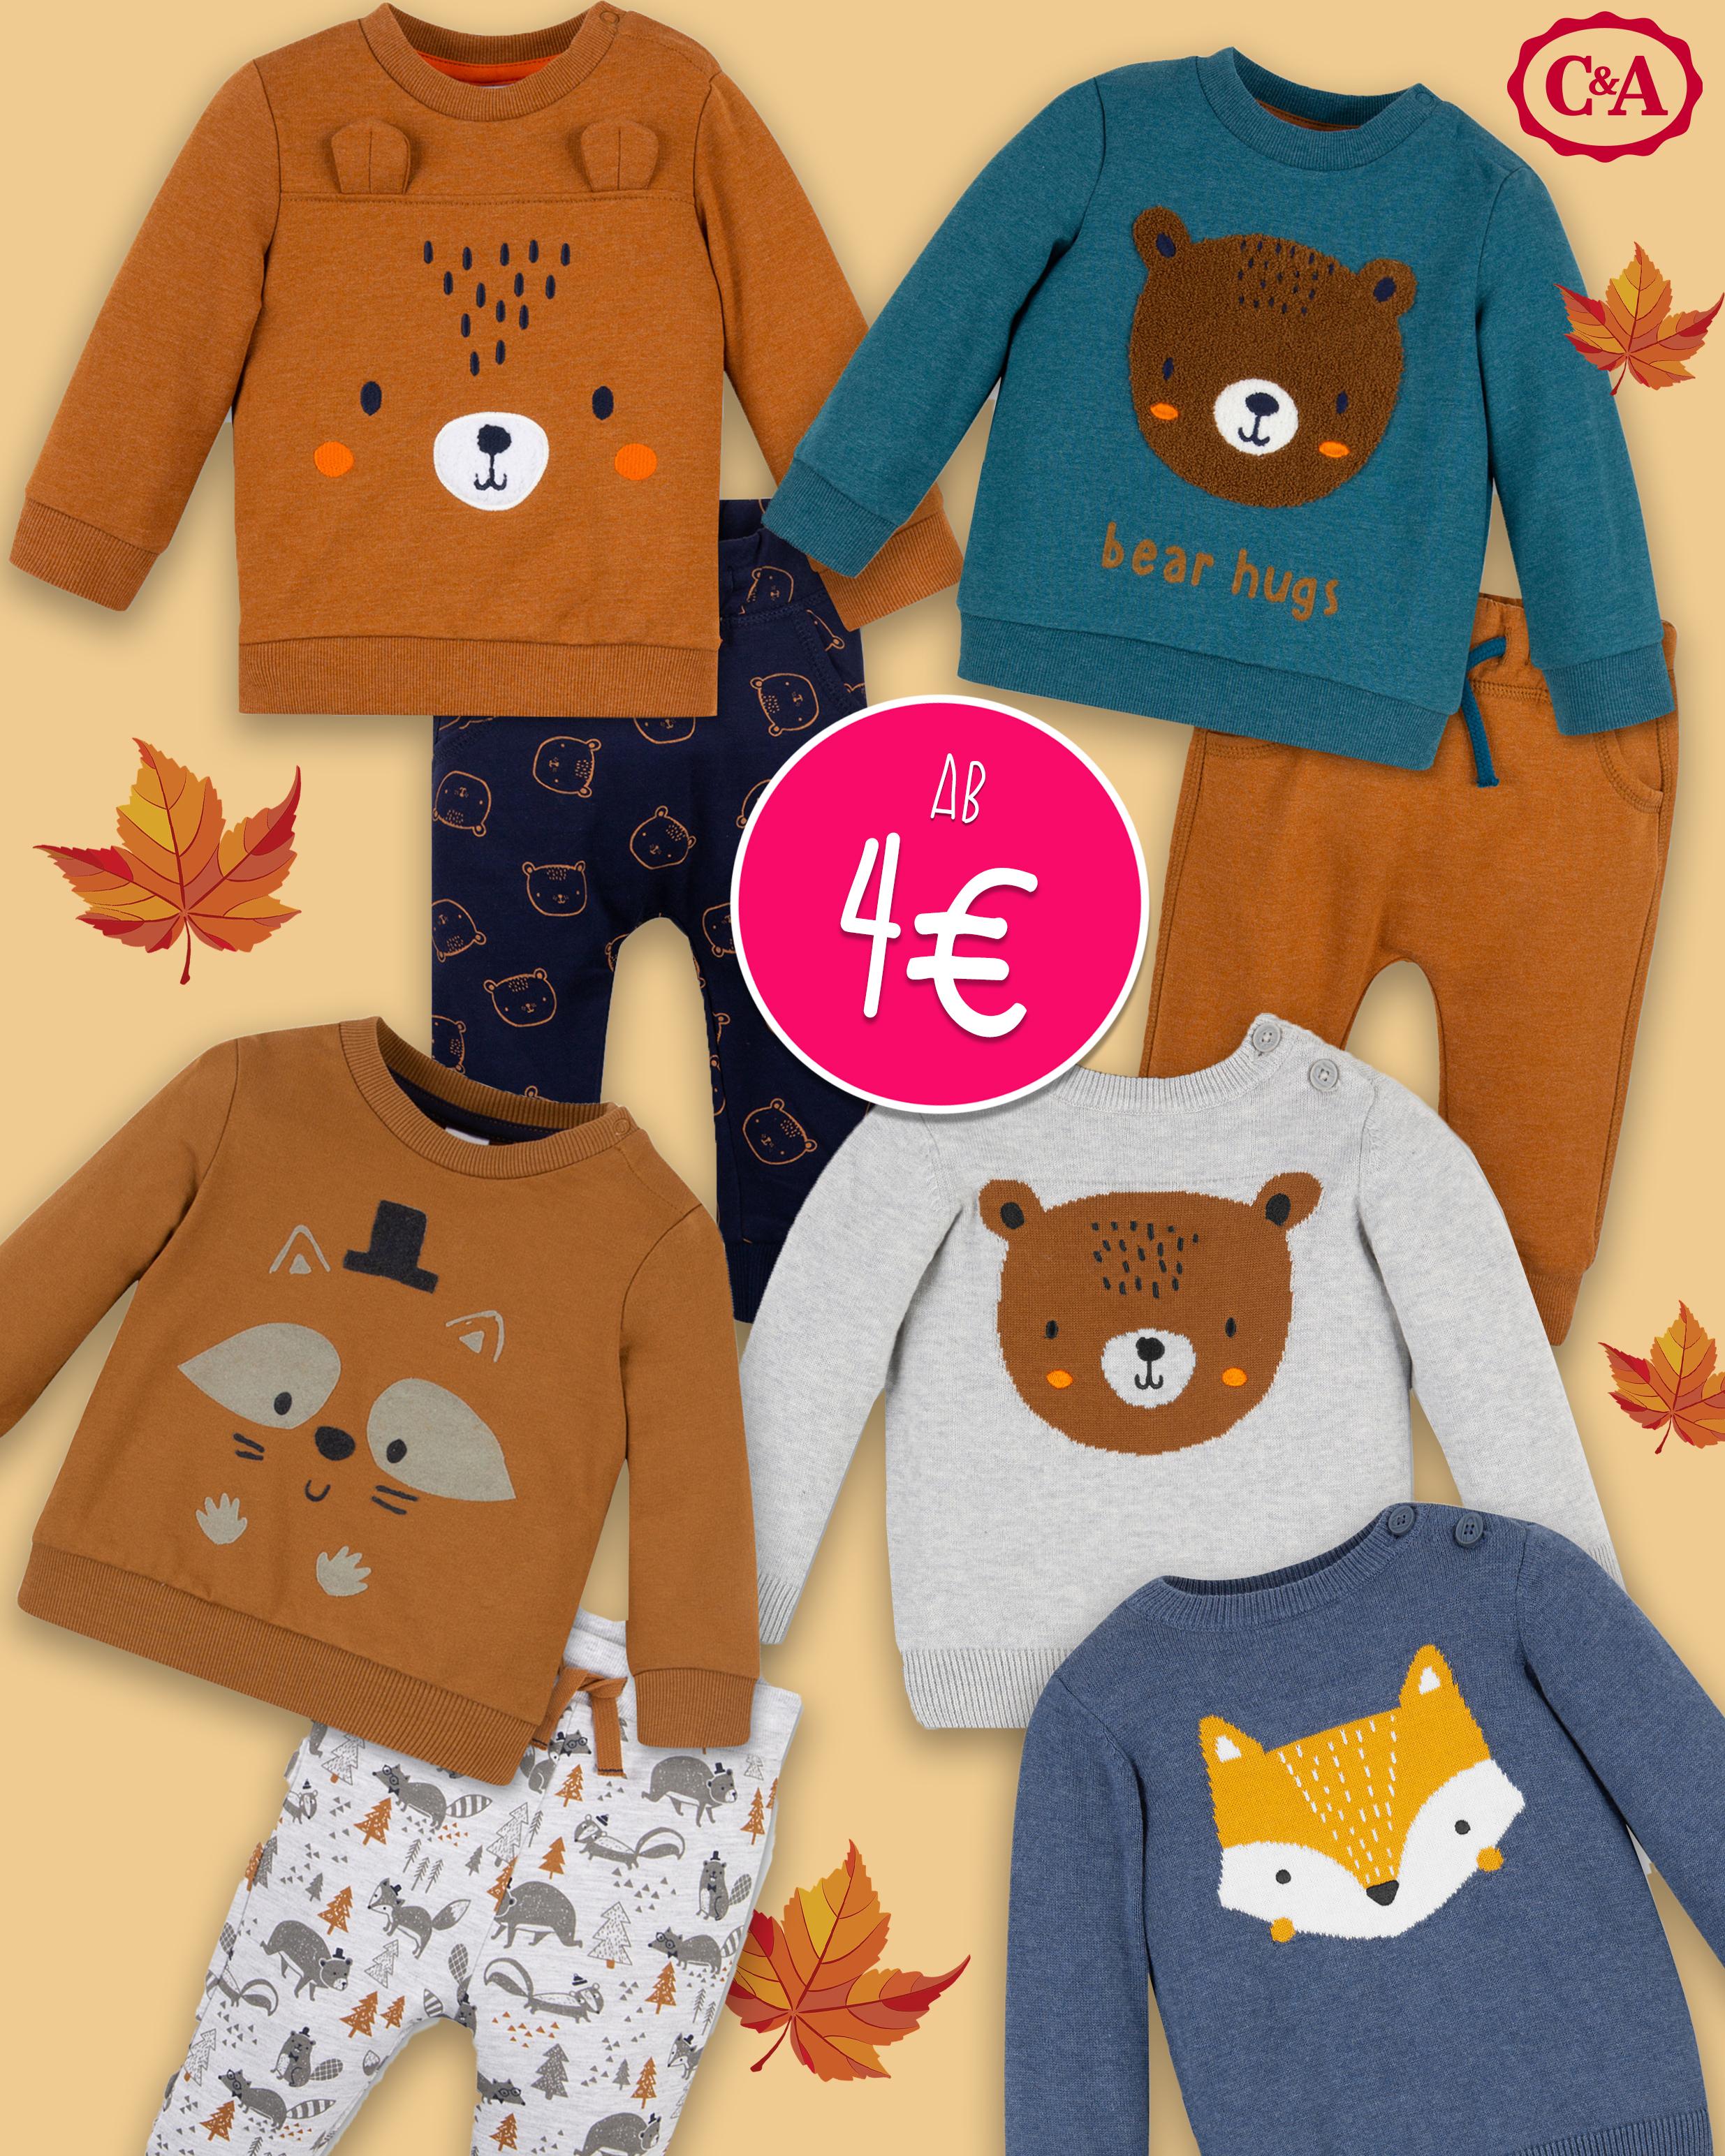 C&A Babymode mit Herbstprints